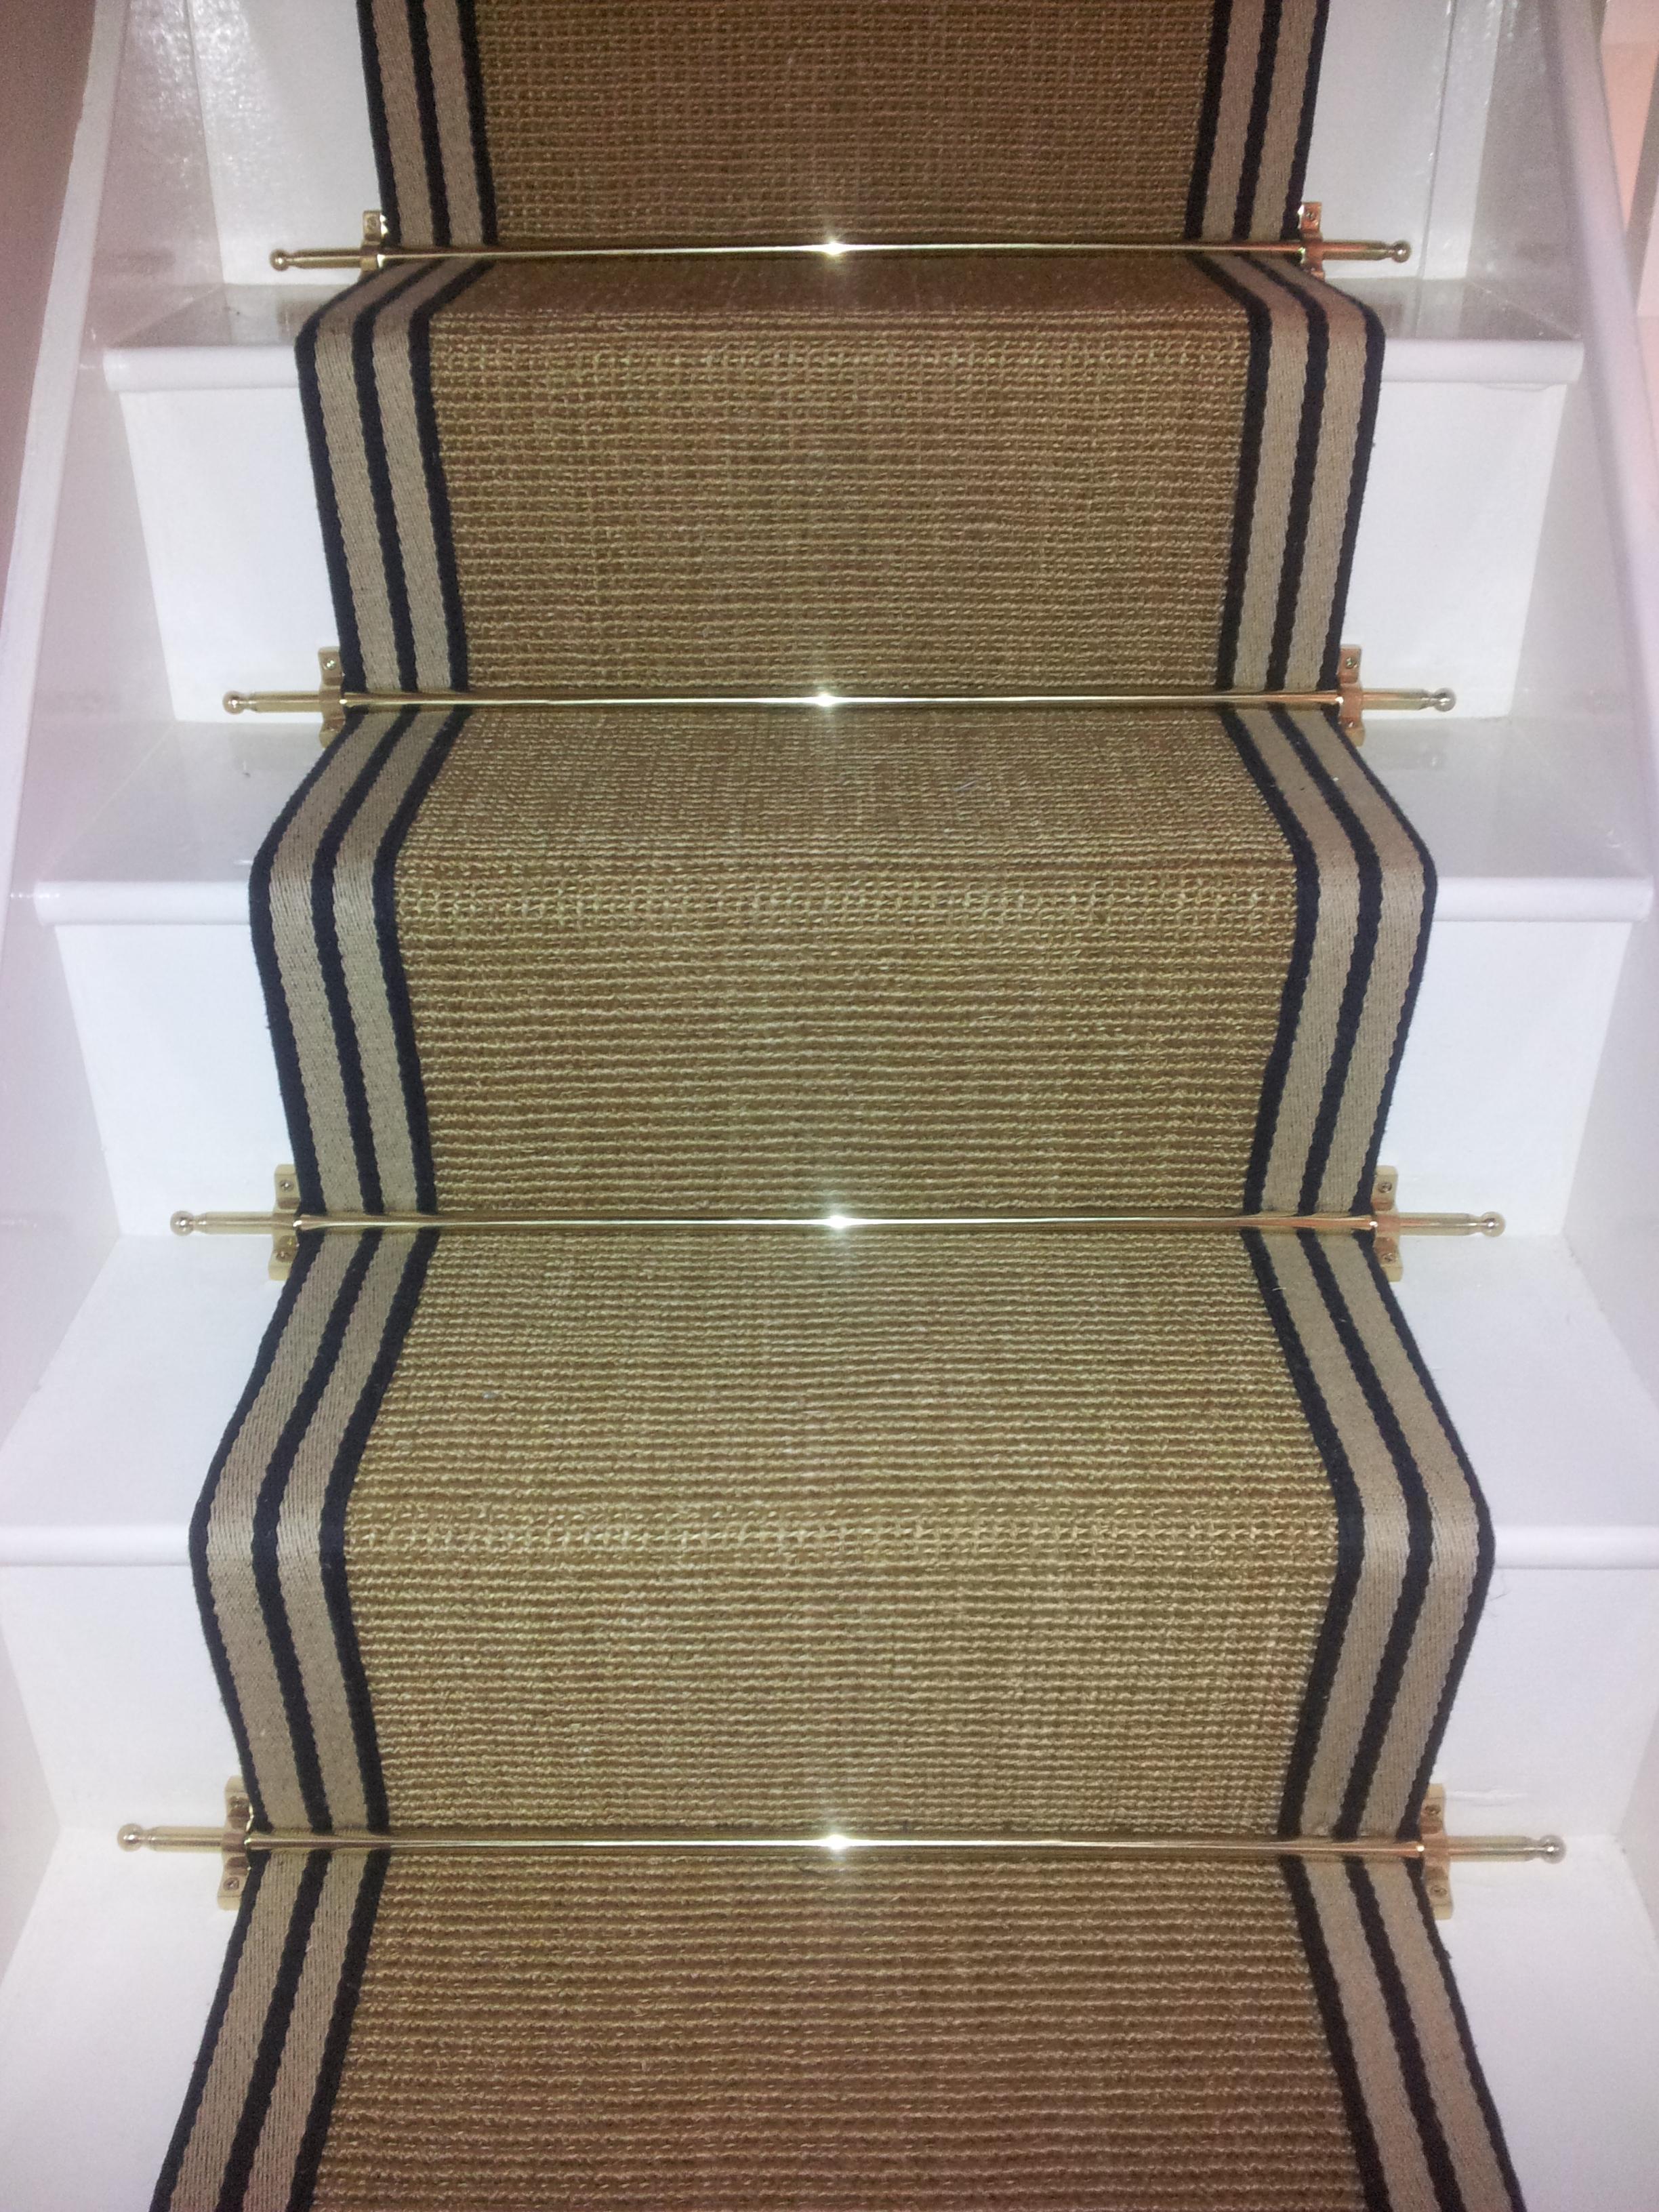 Rug Nice Carpet Stair Treads Lowes For Home Flooring Ideas Regarding Sisal Stair Tread Rugs (#16 of 20)